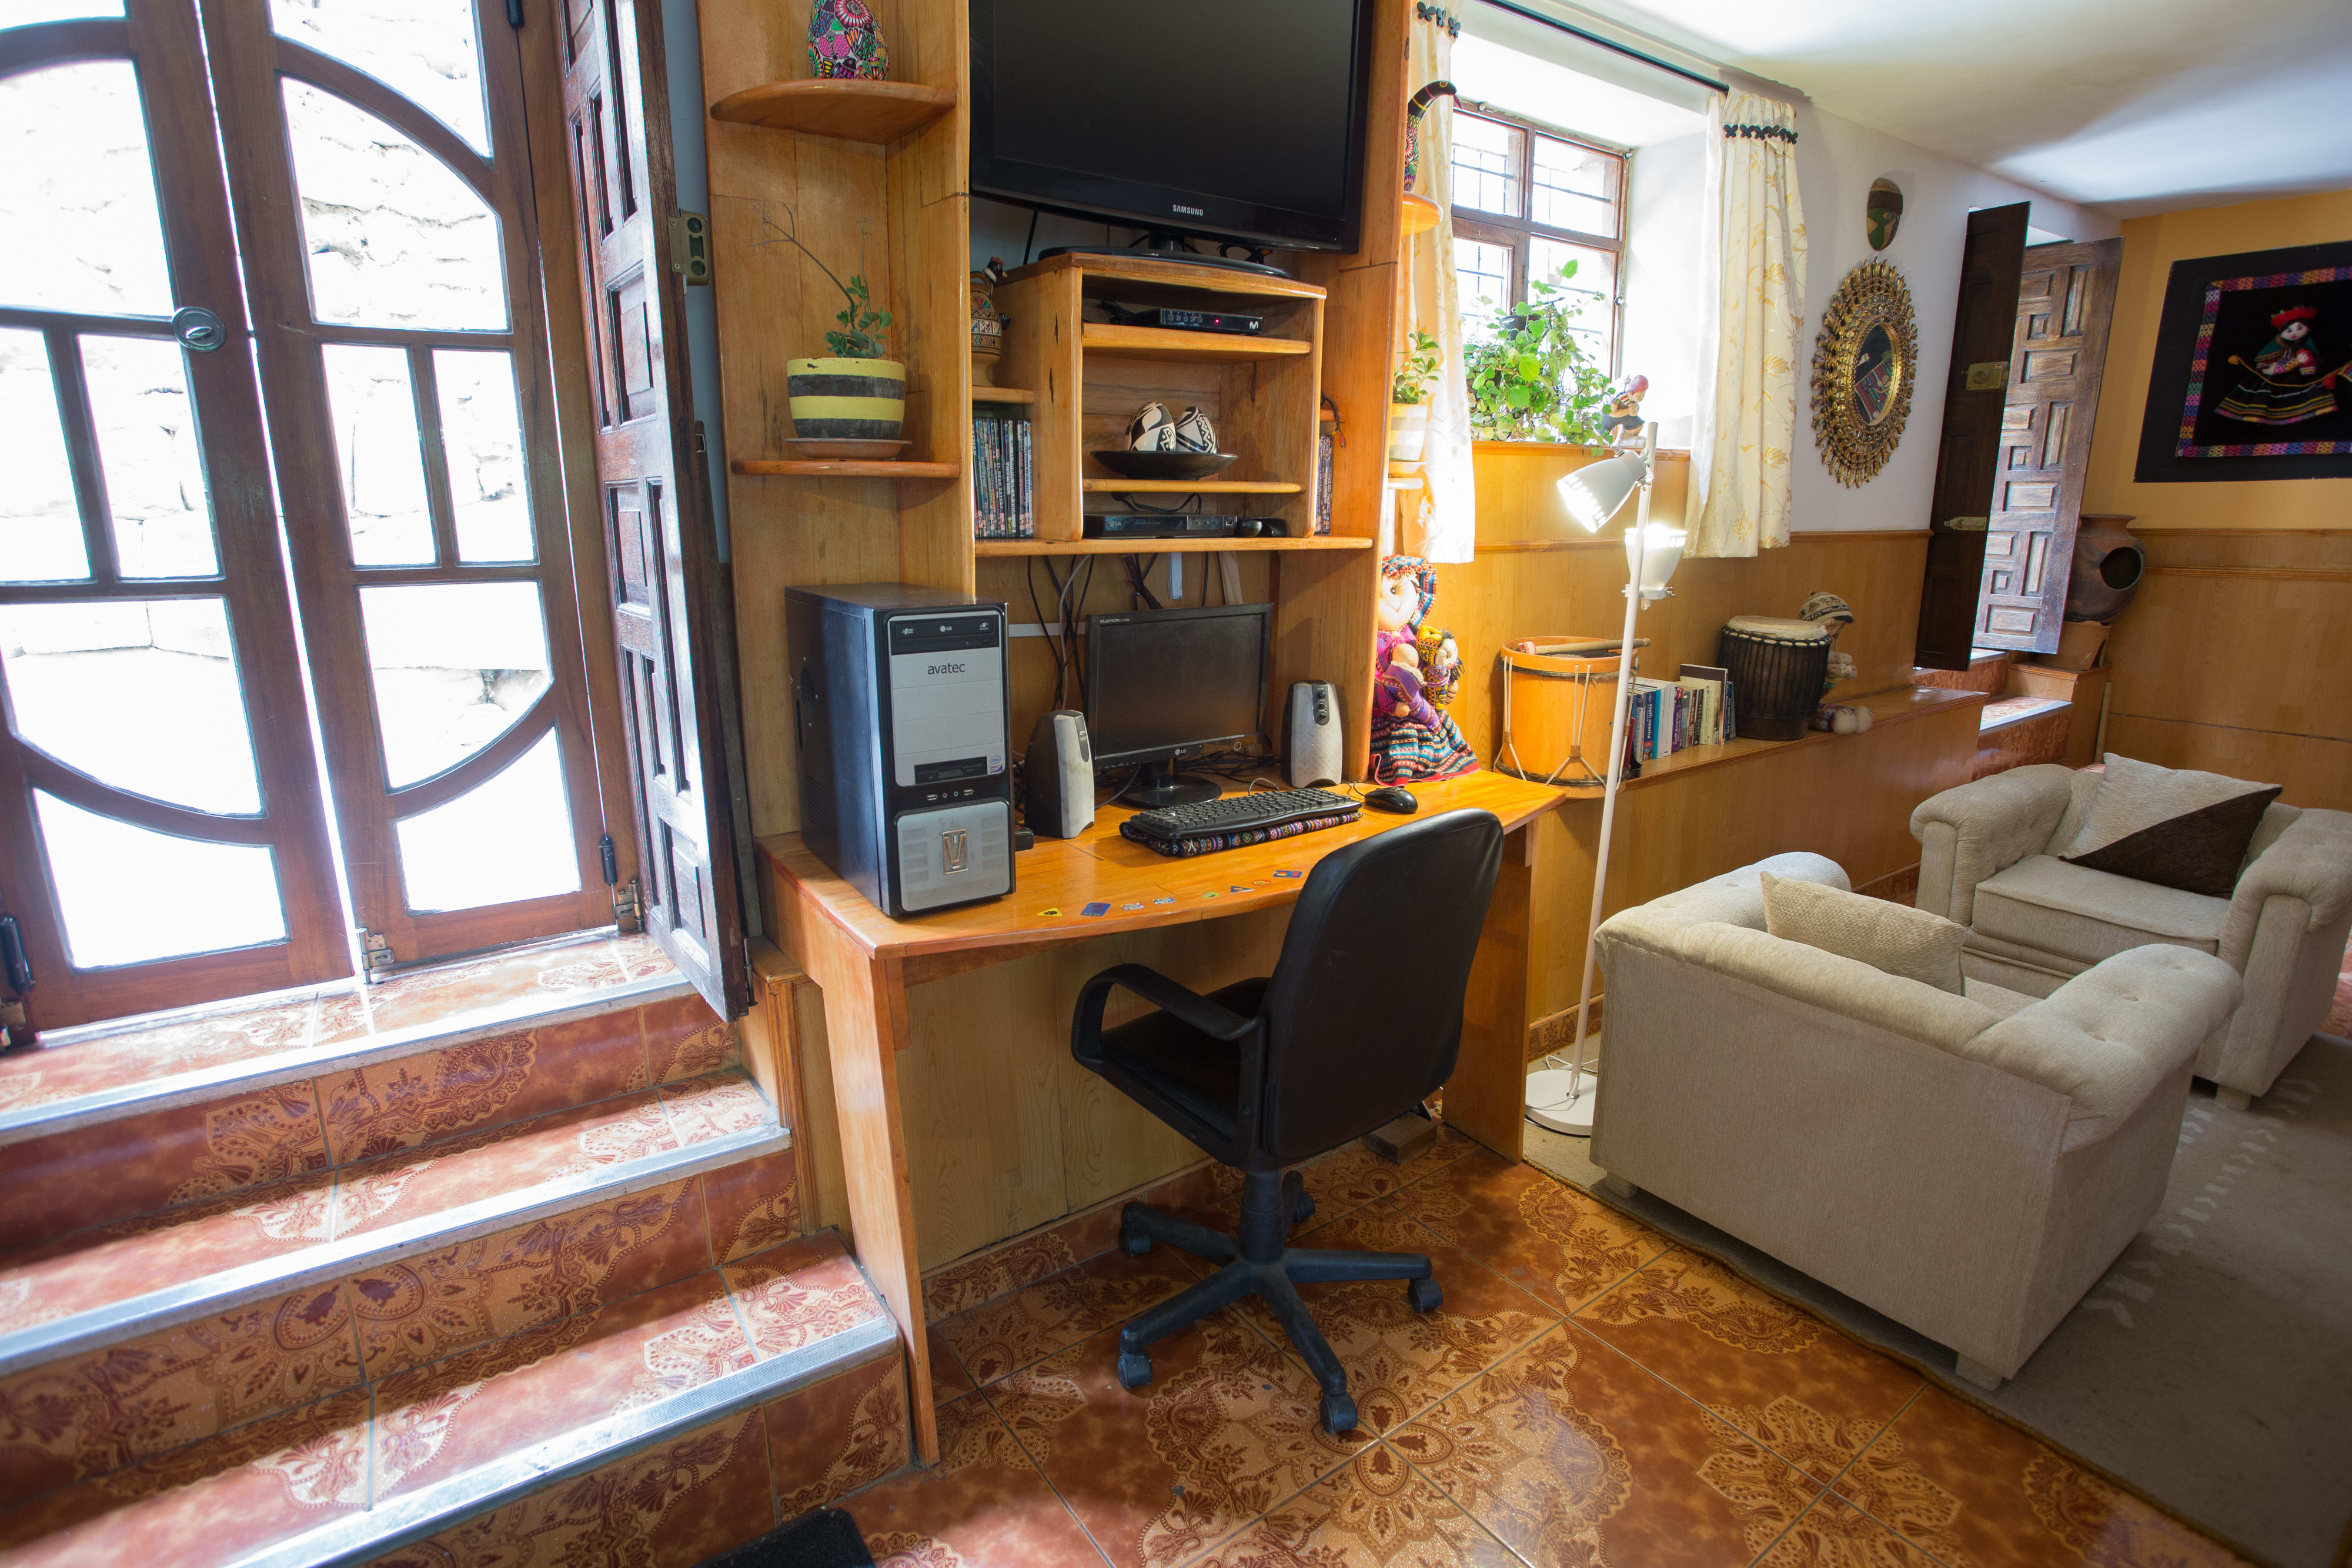 Sumac Chaska Hostel